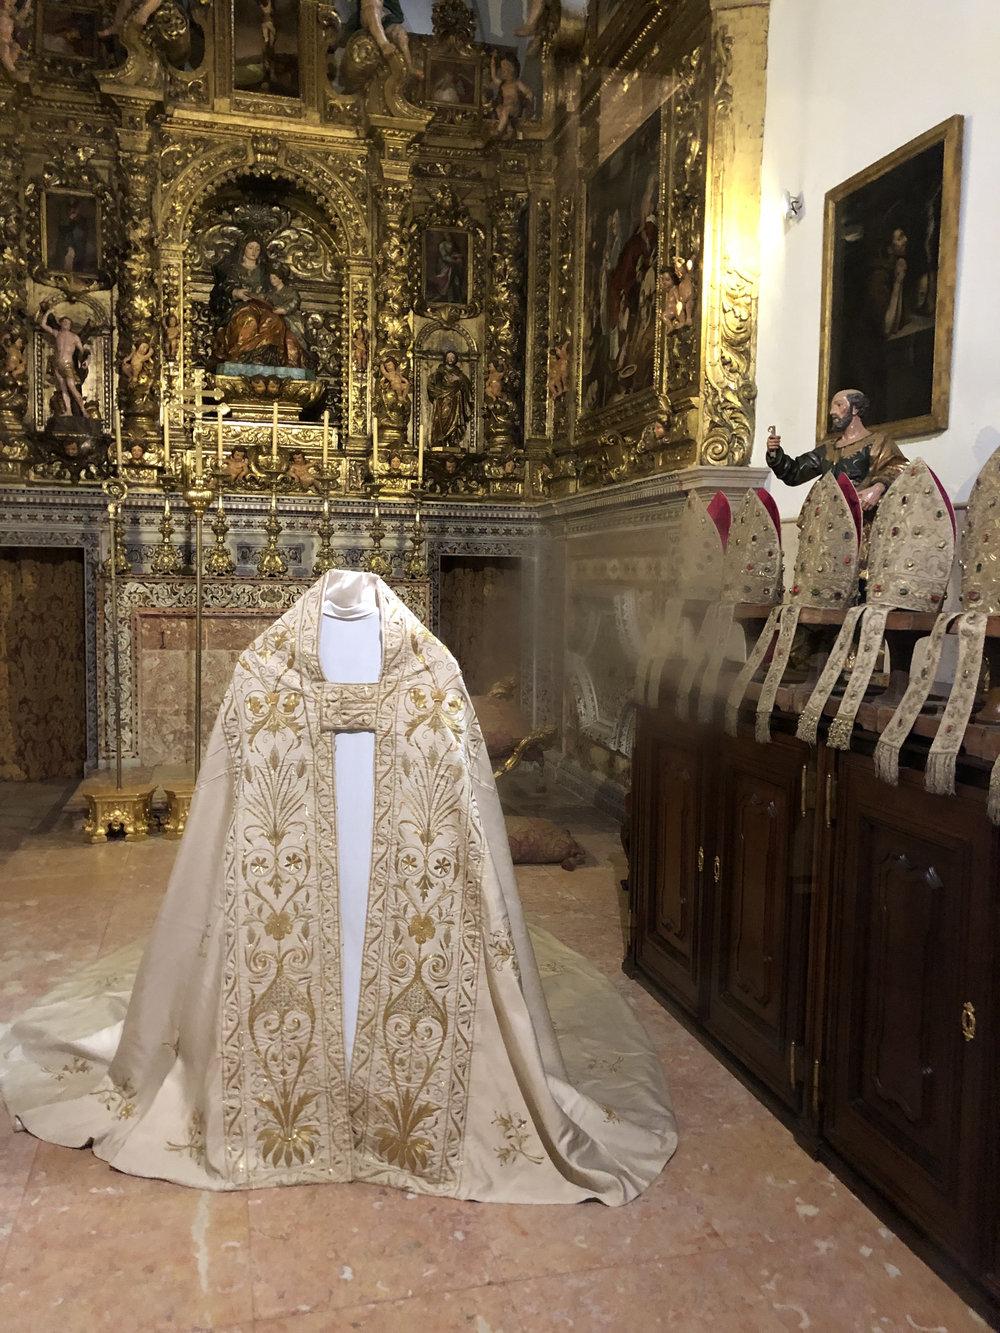 teri_lisbon_portugal_cathedral_spiritedtable_photo07.jpg